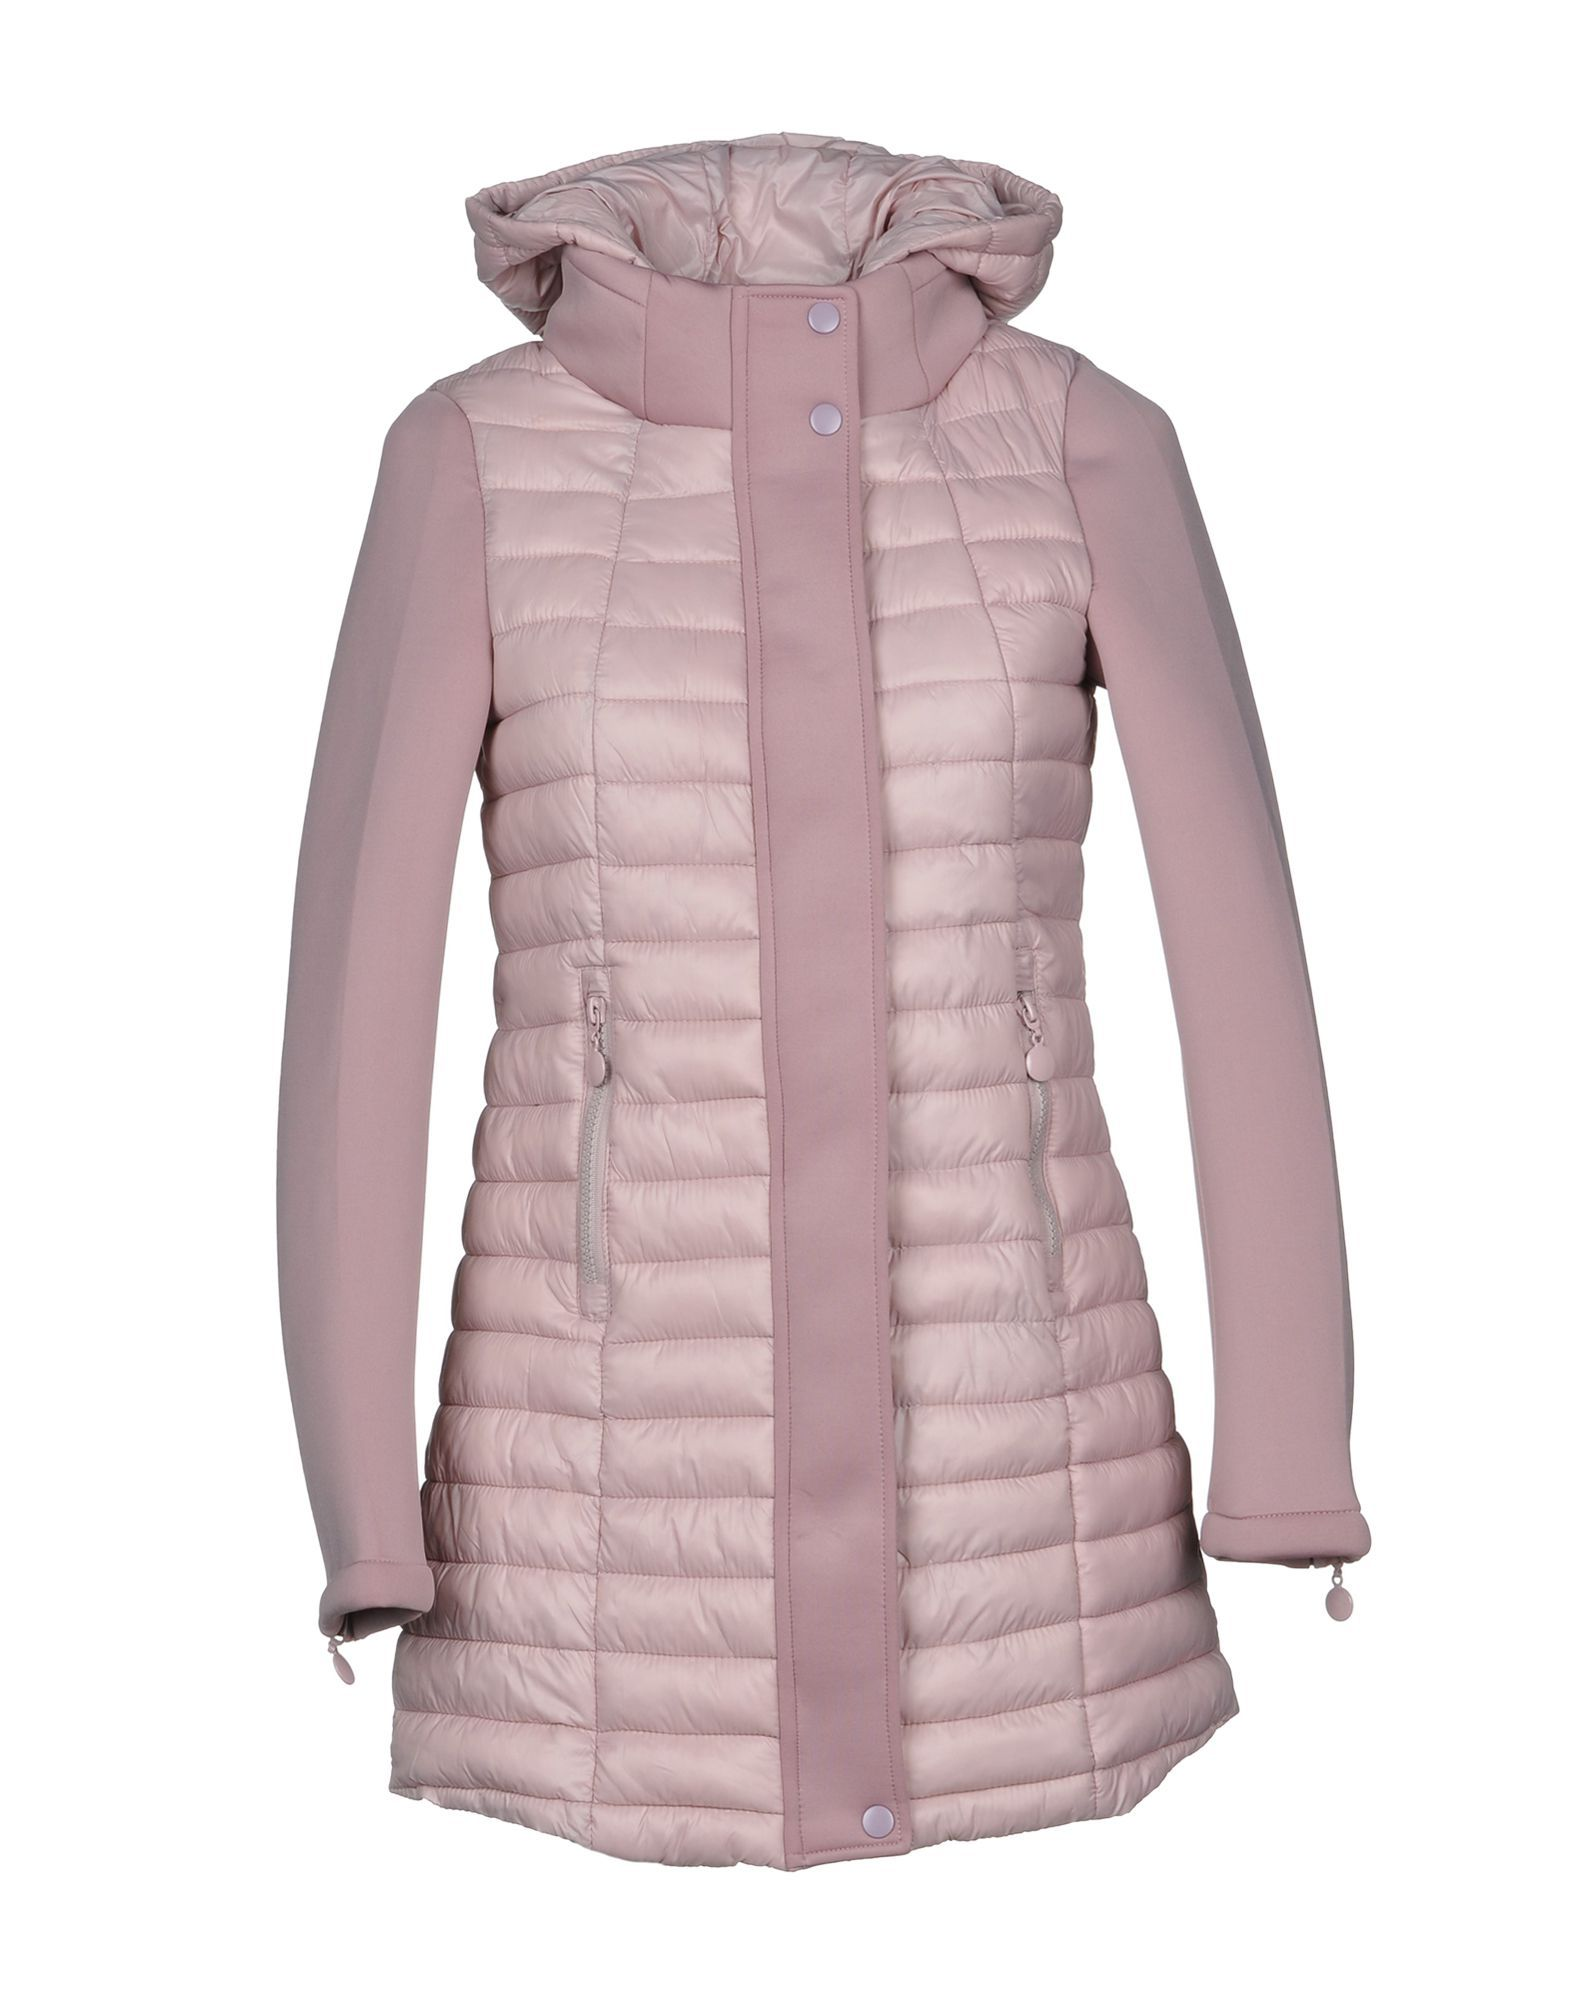 COATS & JACKETS Bini Como Pink Woman Nylon